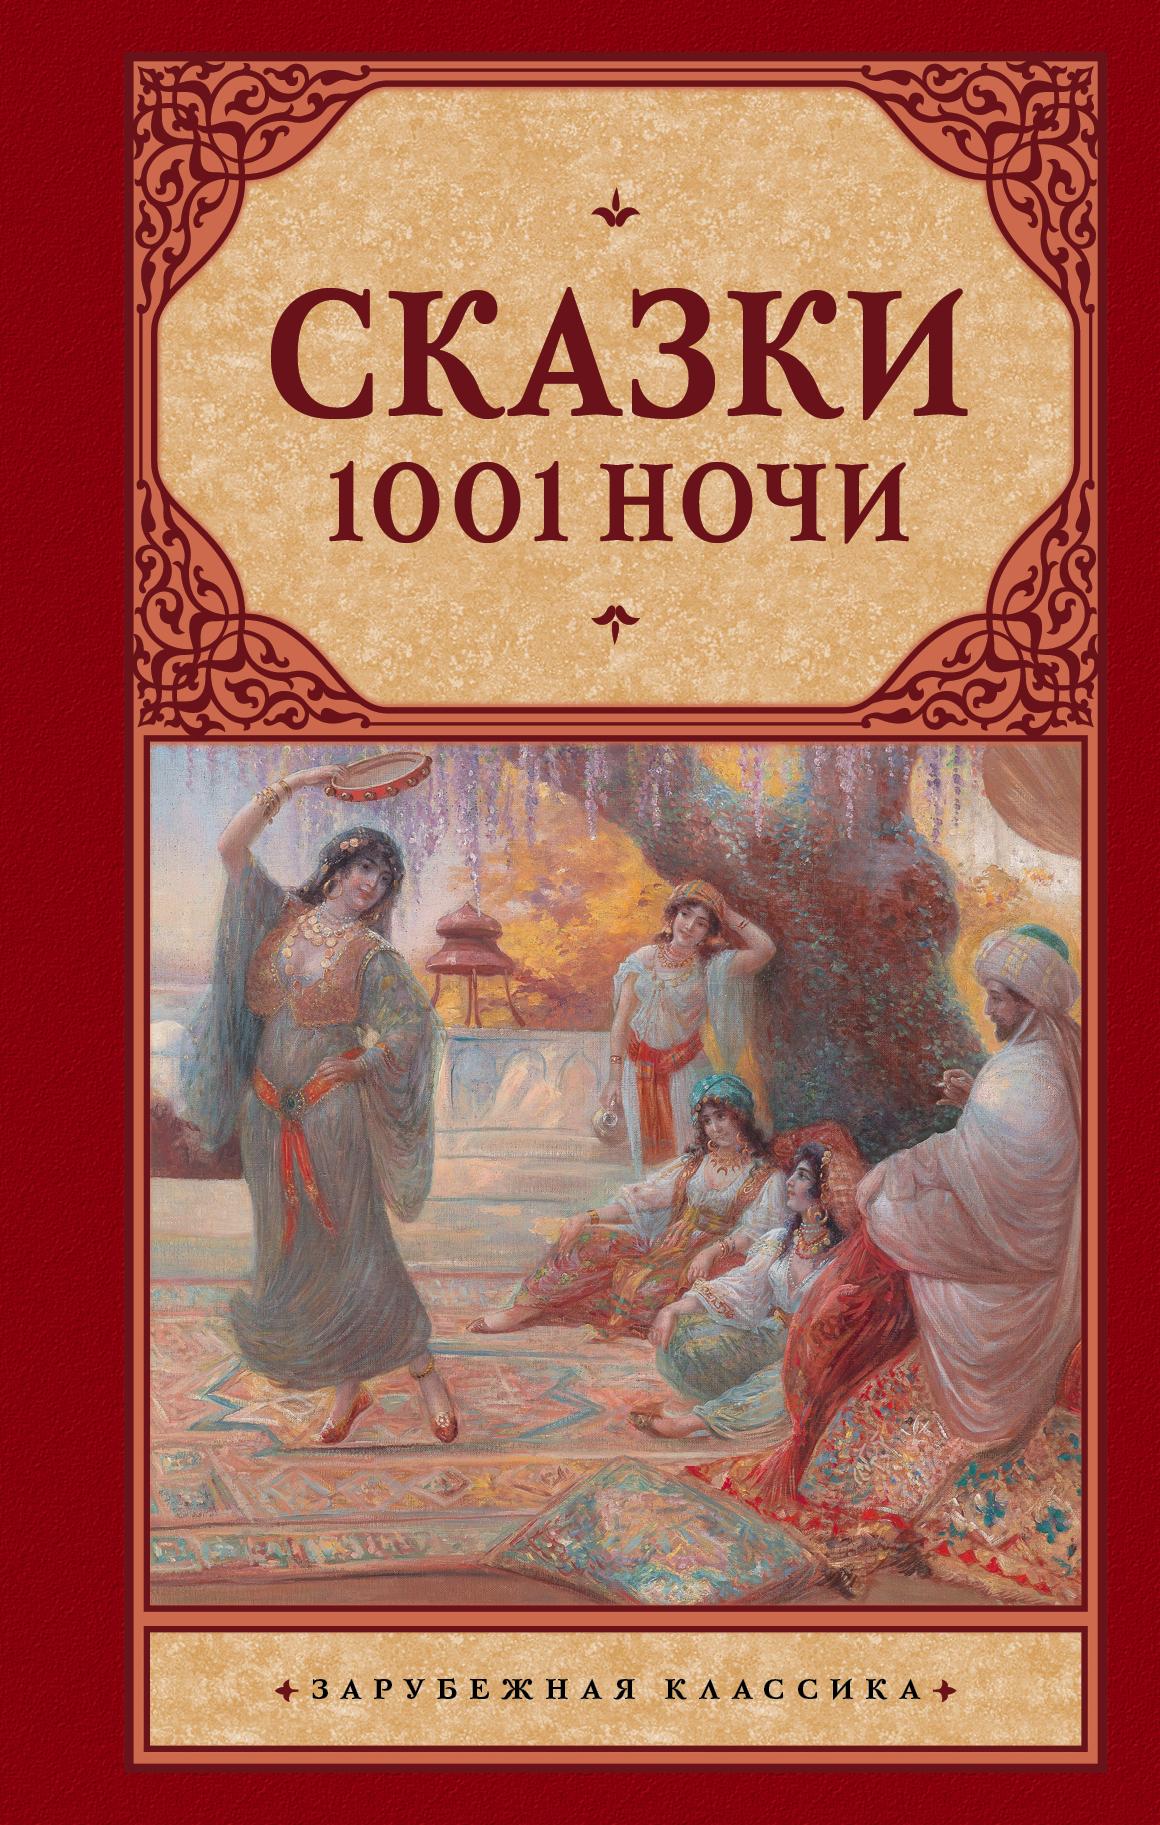 Салье М.А. Сказки 1001 ночи